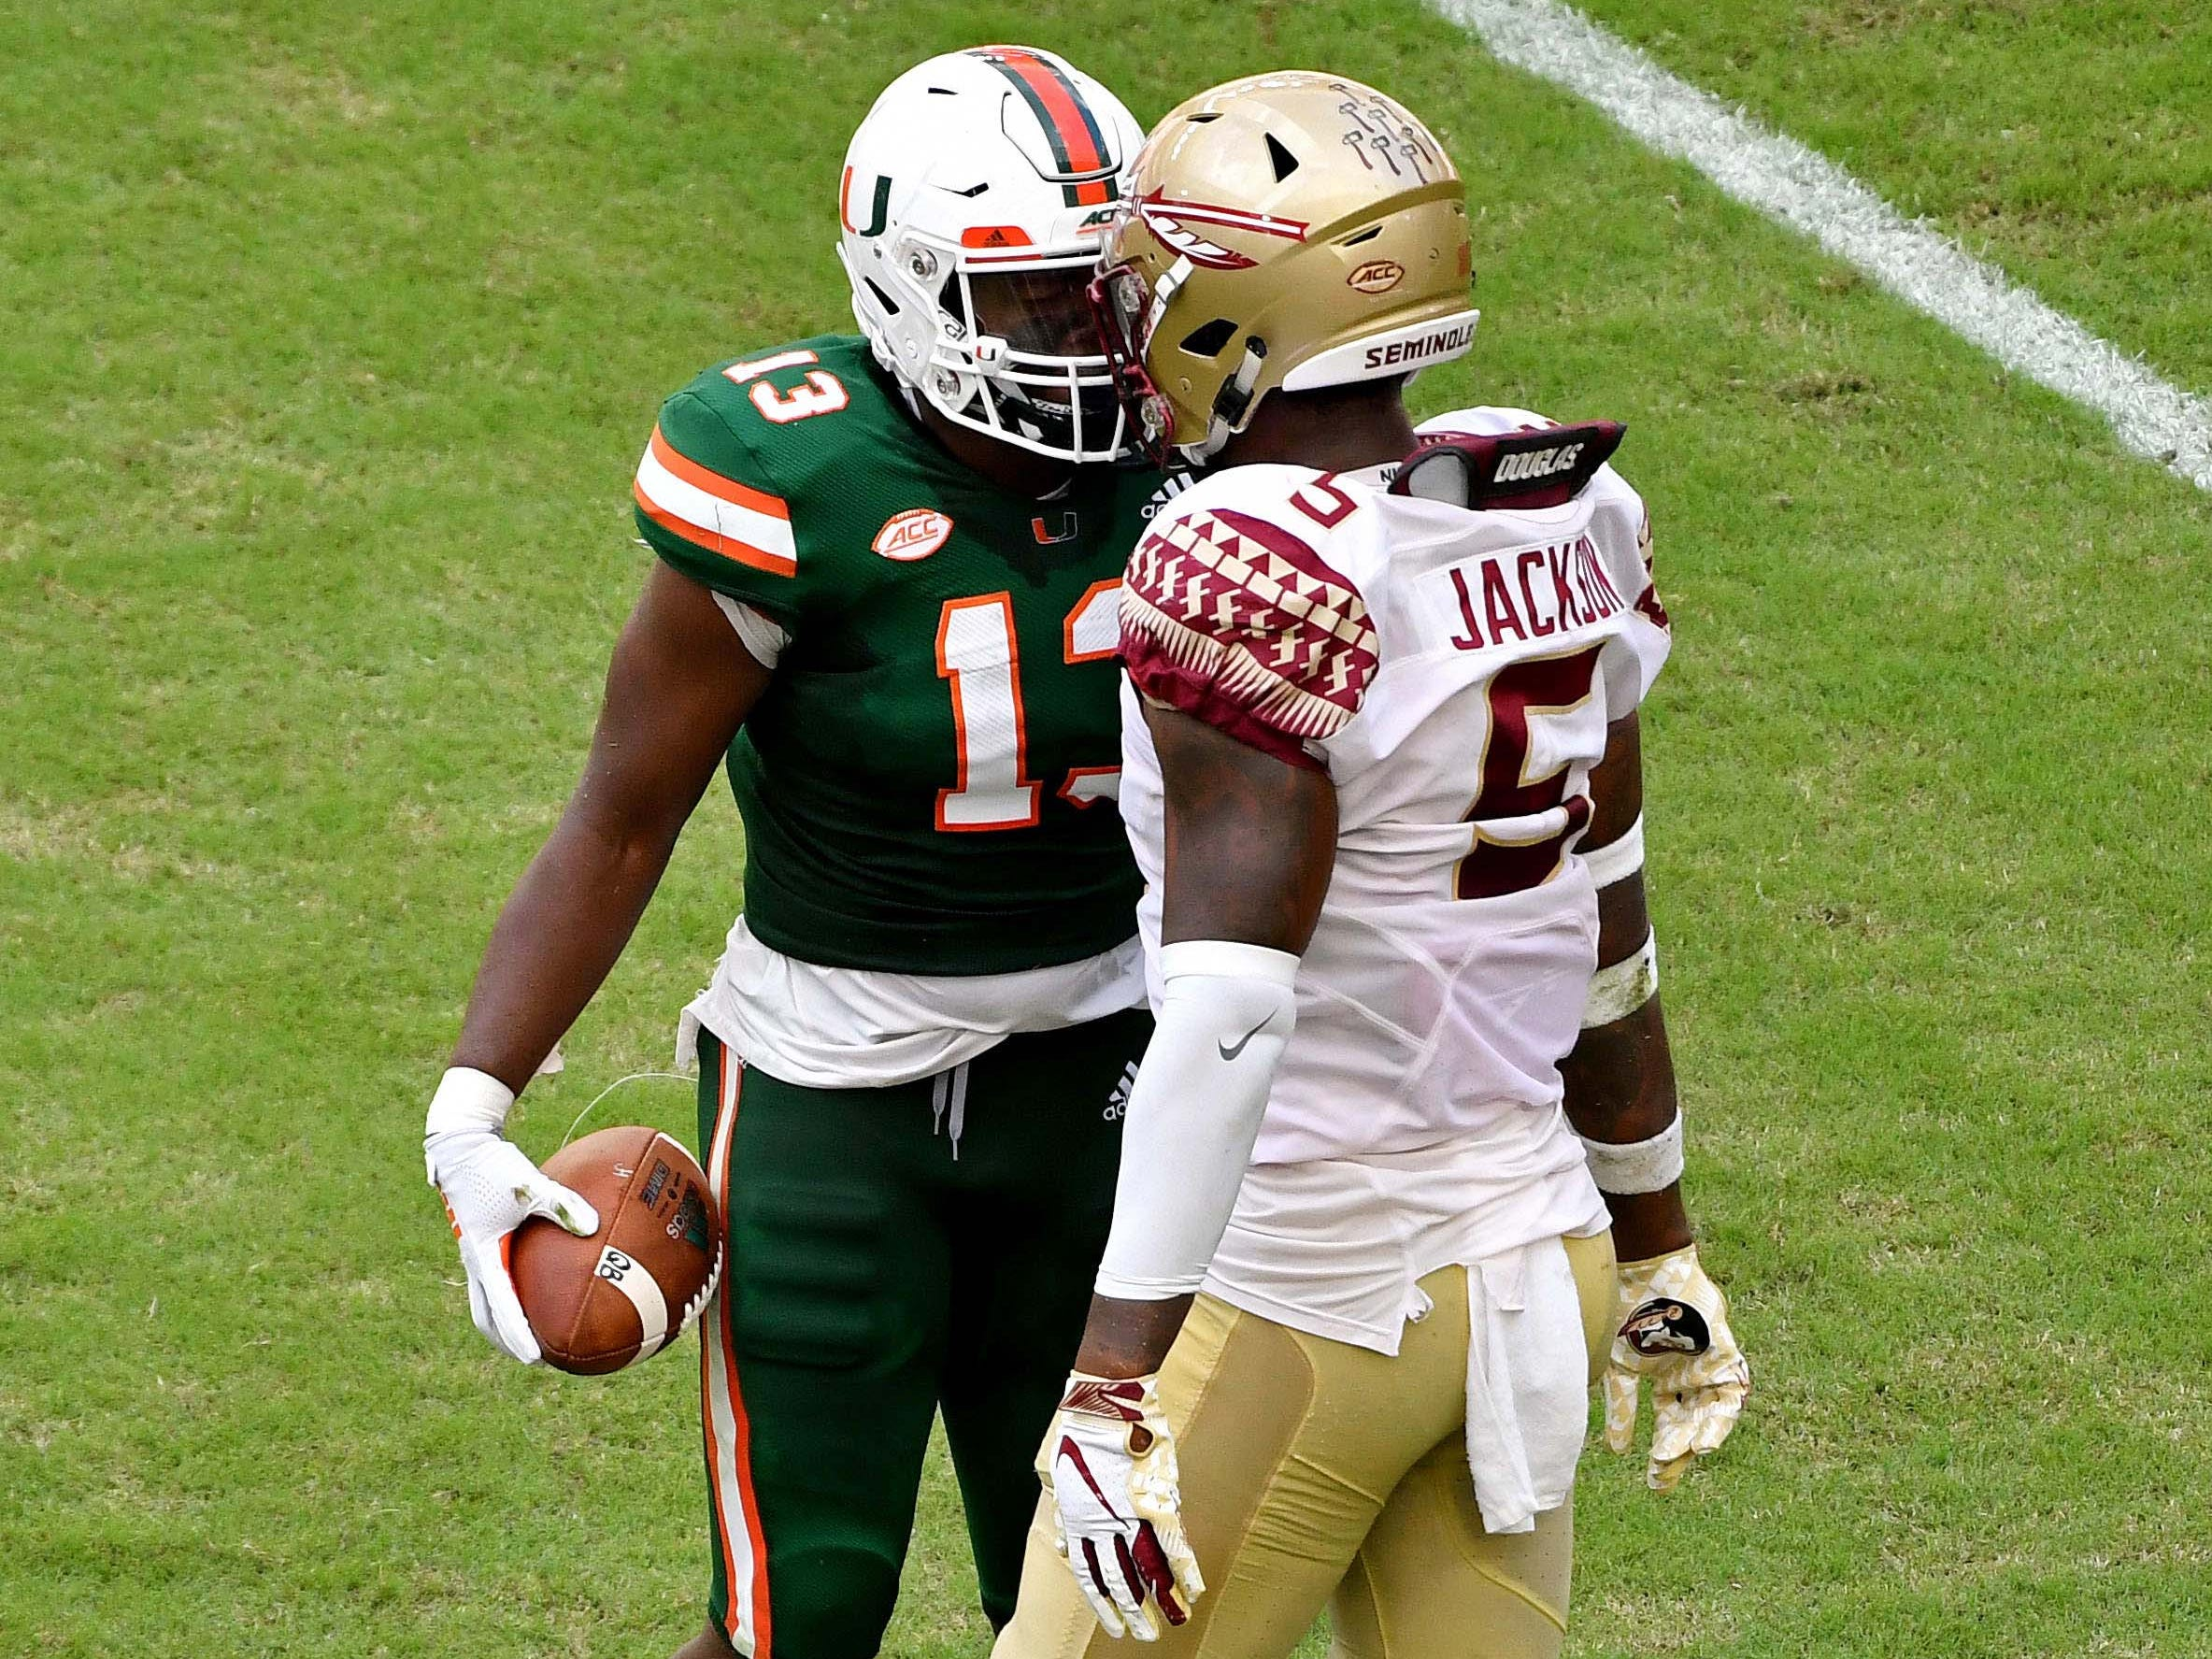 Miami Hurricanes running back DeeJay Dallas and Florida State Seminoles linebacker Dontavious Jackson both exchange words during the first half at Hard Rock Stadium.